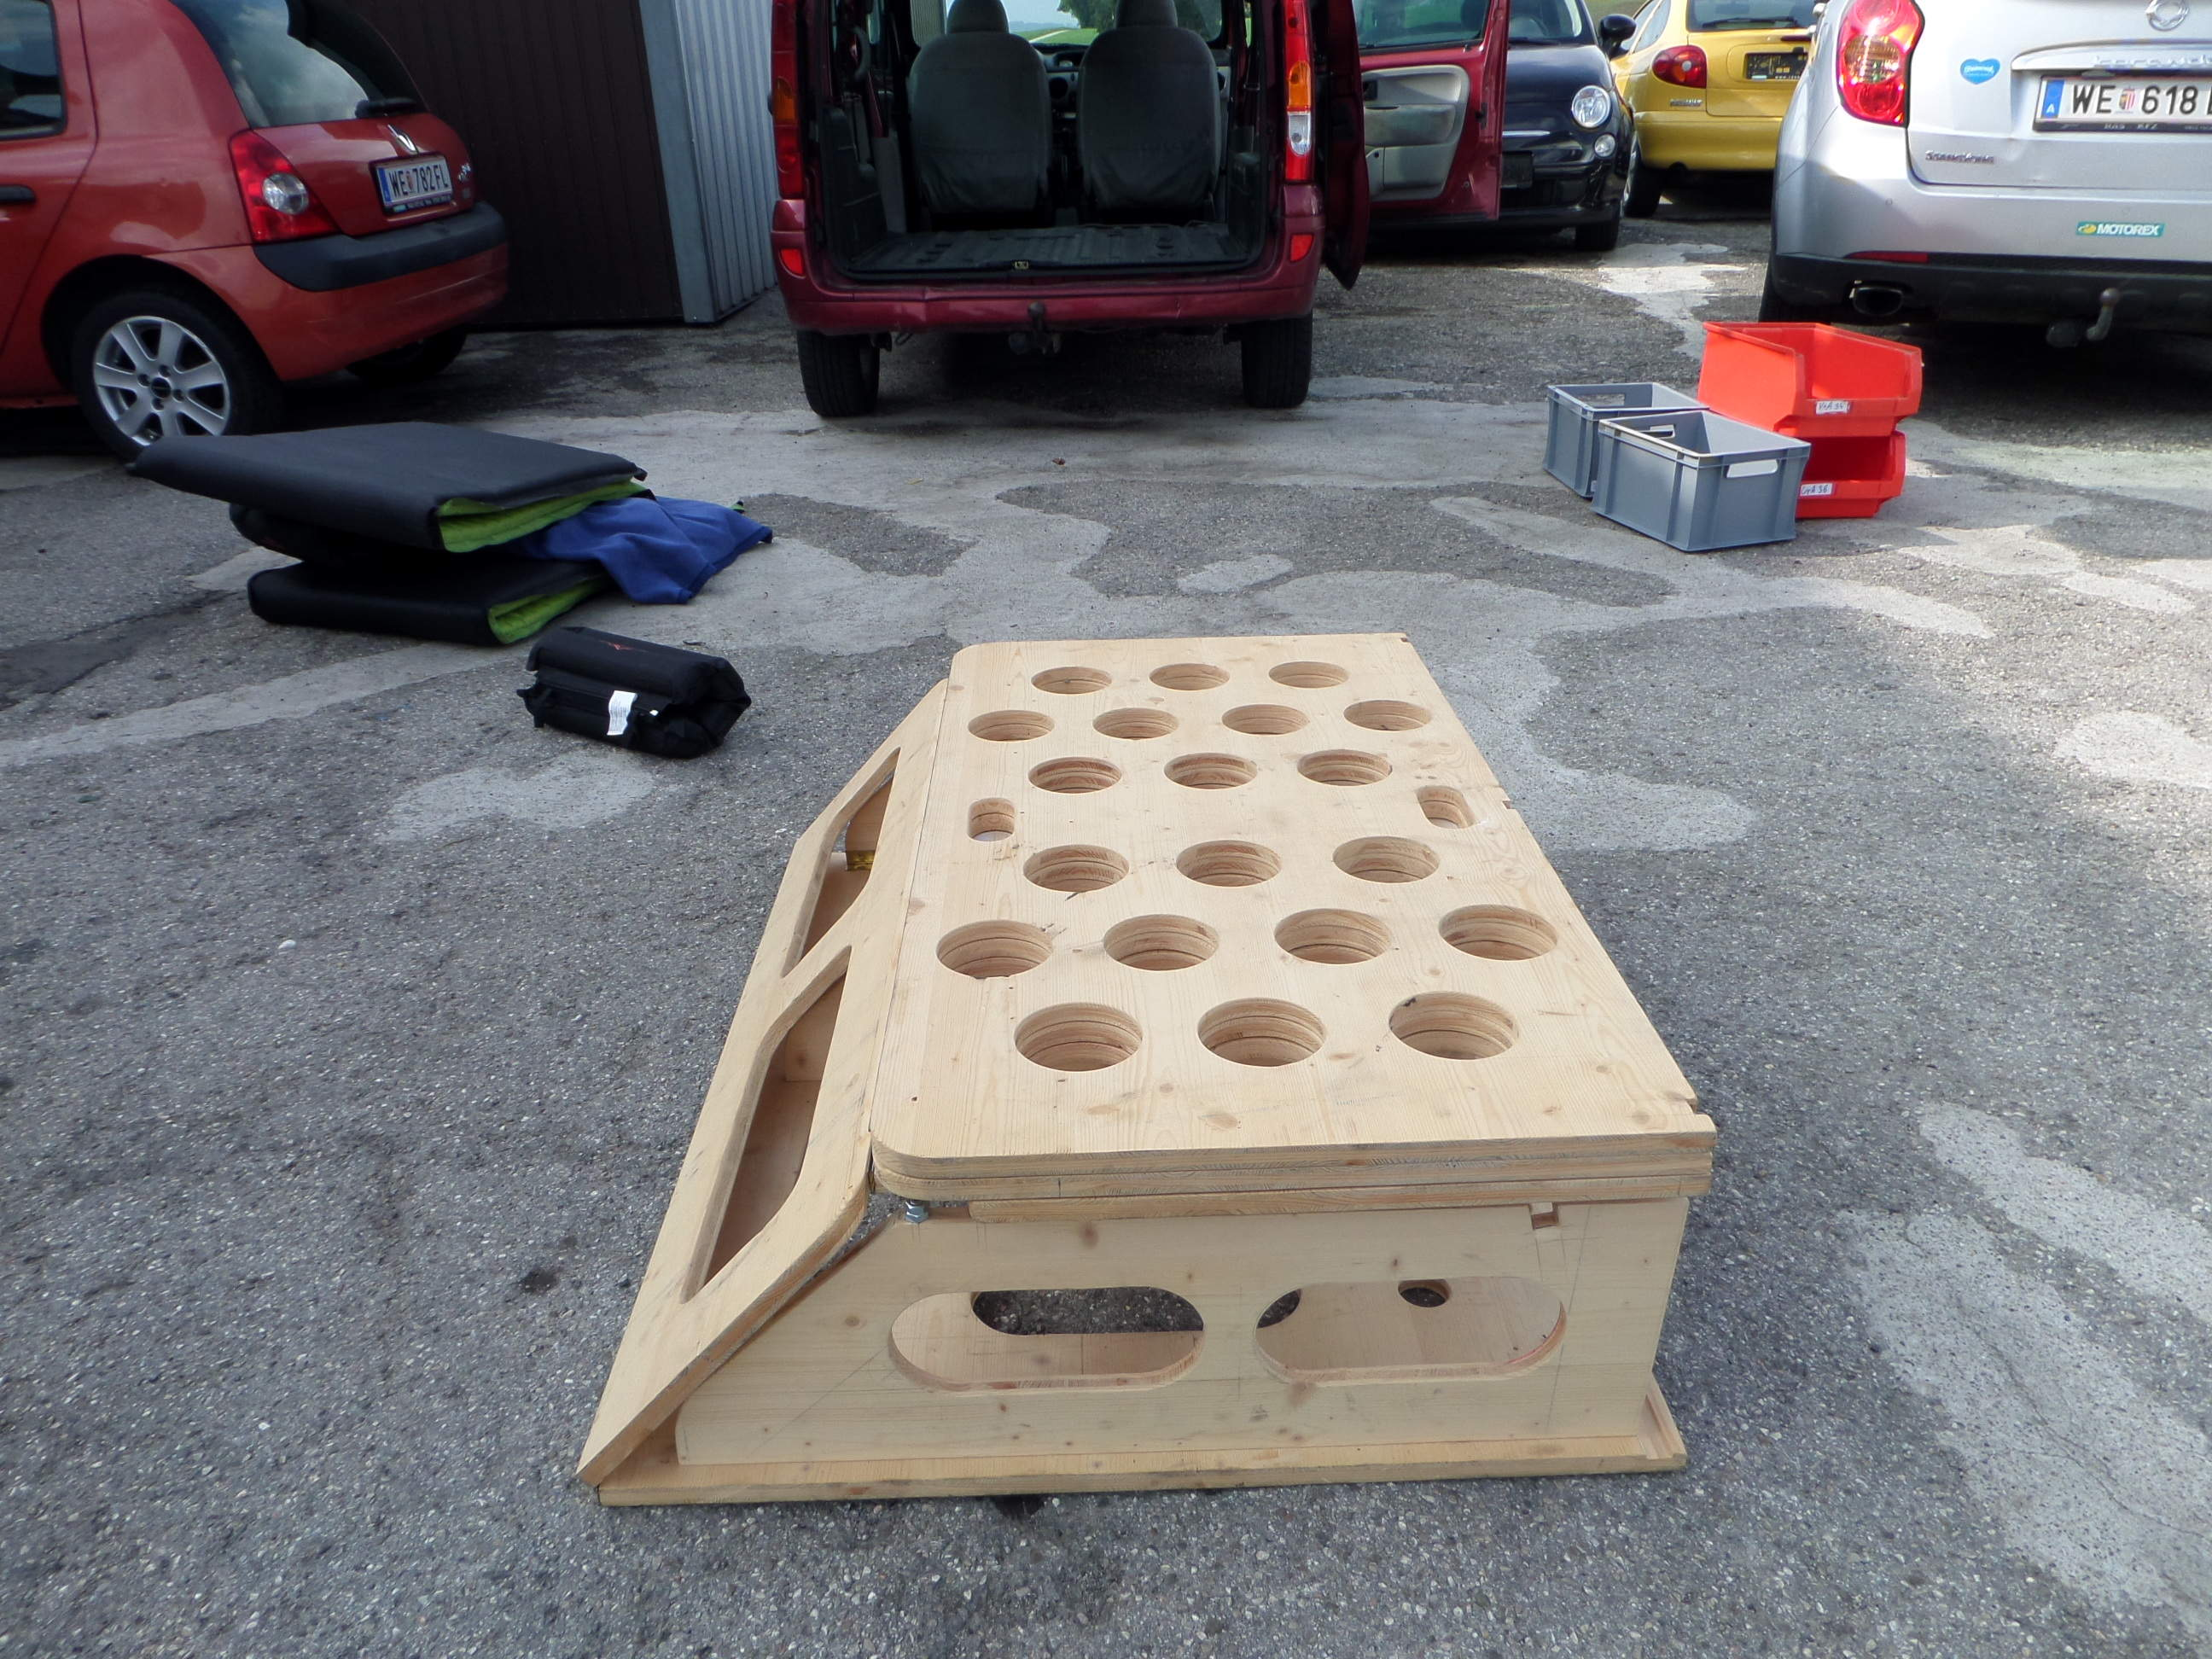 renault kangoo campingbett kangoo renault sportbedarf und. Black Bedroom Furniture Sets. Home Design Ideas